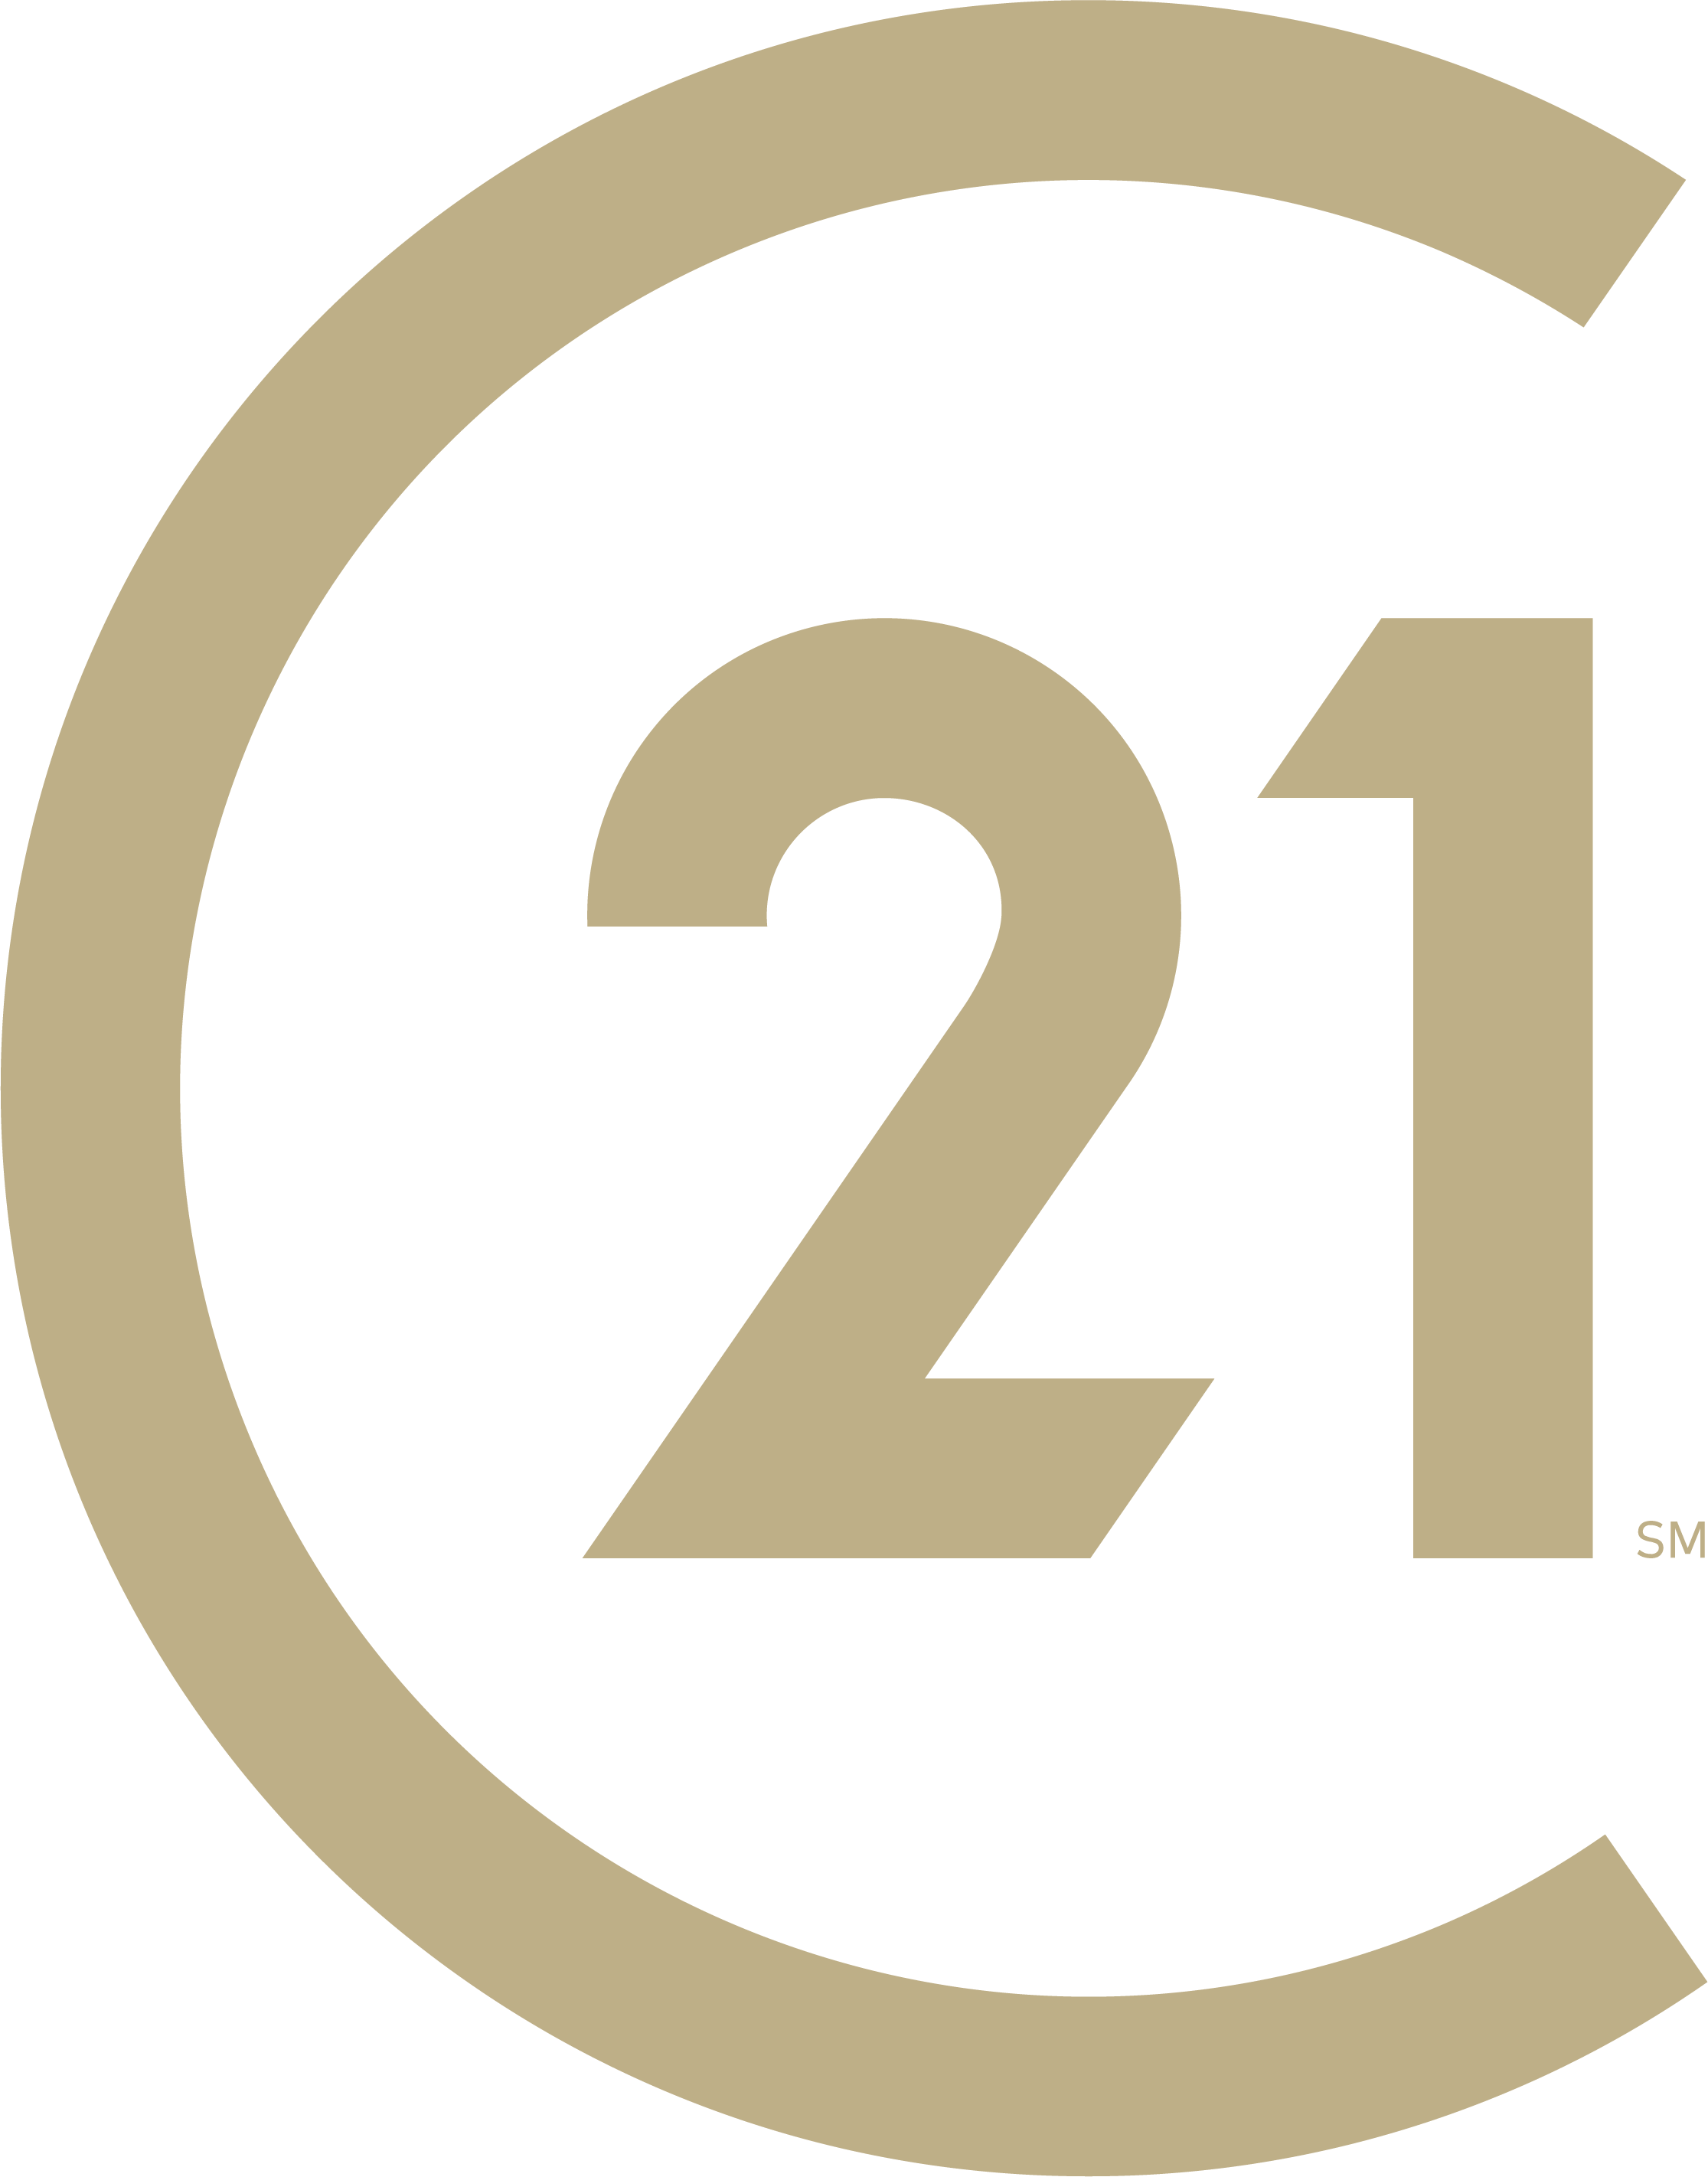 Jo Ann Cauley Century 21 Realtor, Cortez Real Estate